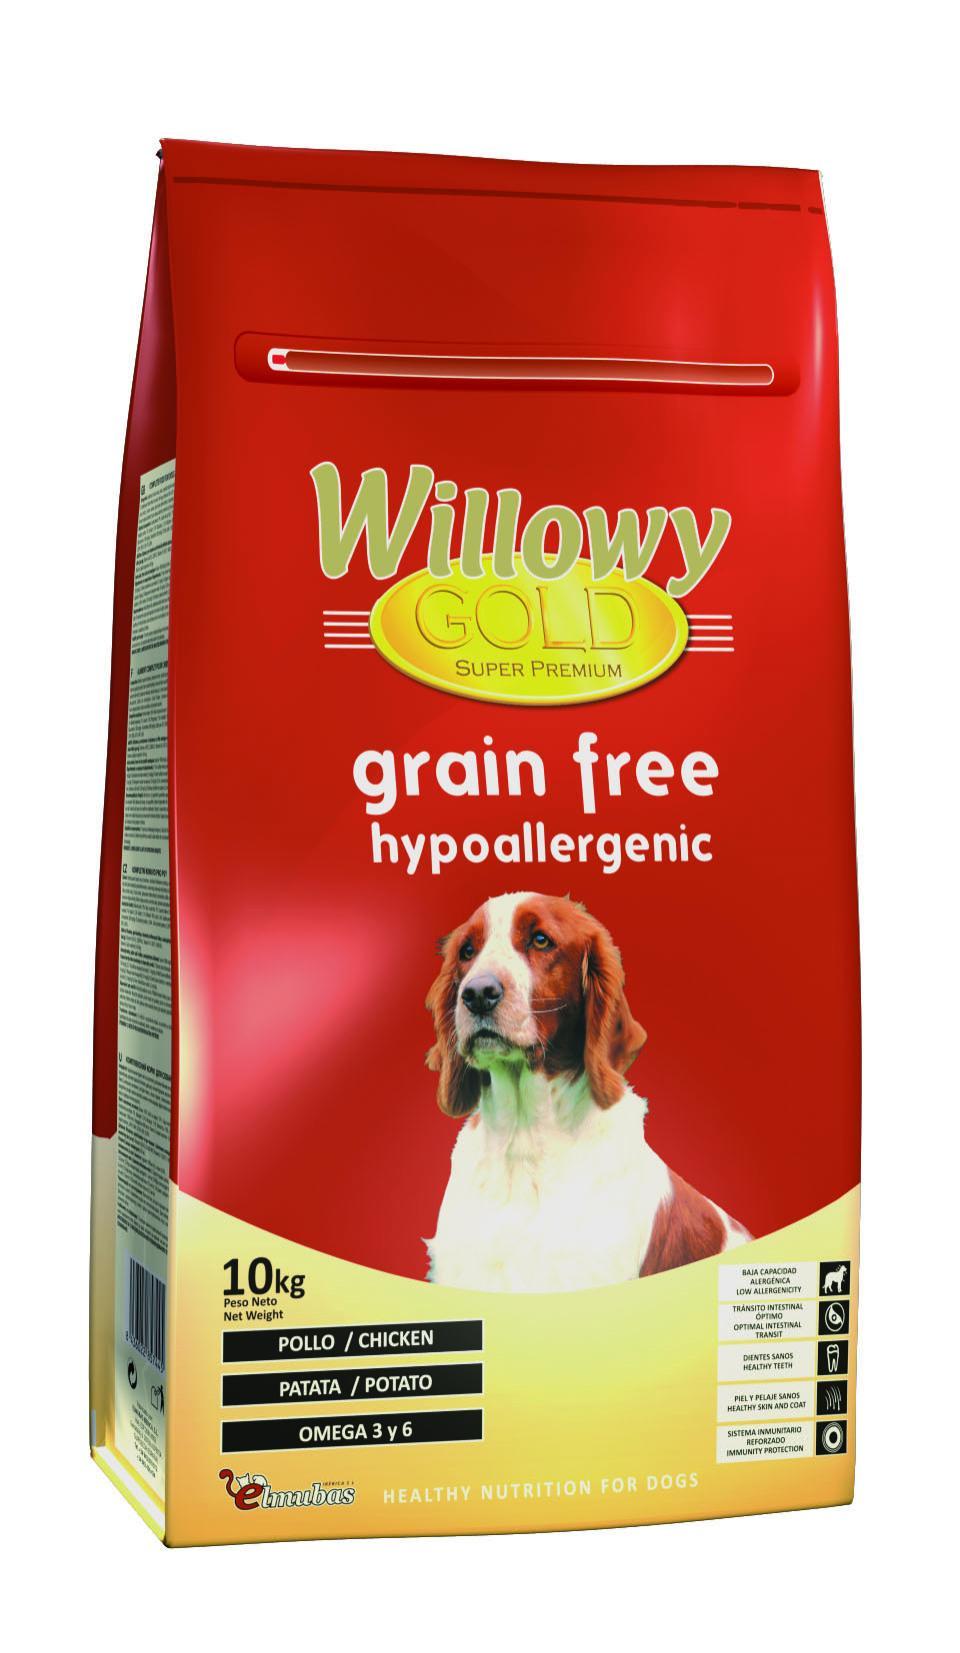 Willowy Gold GRAIN FREE. Hypoallergenic